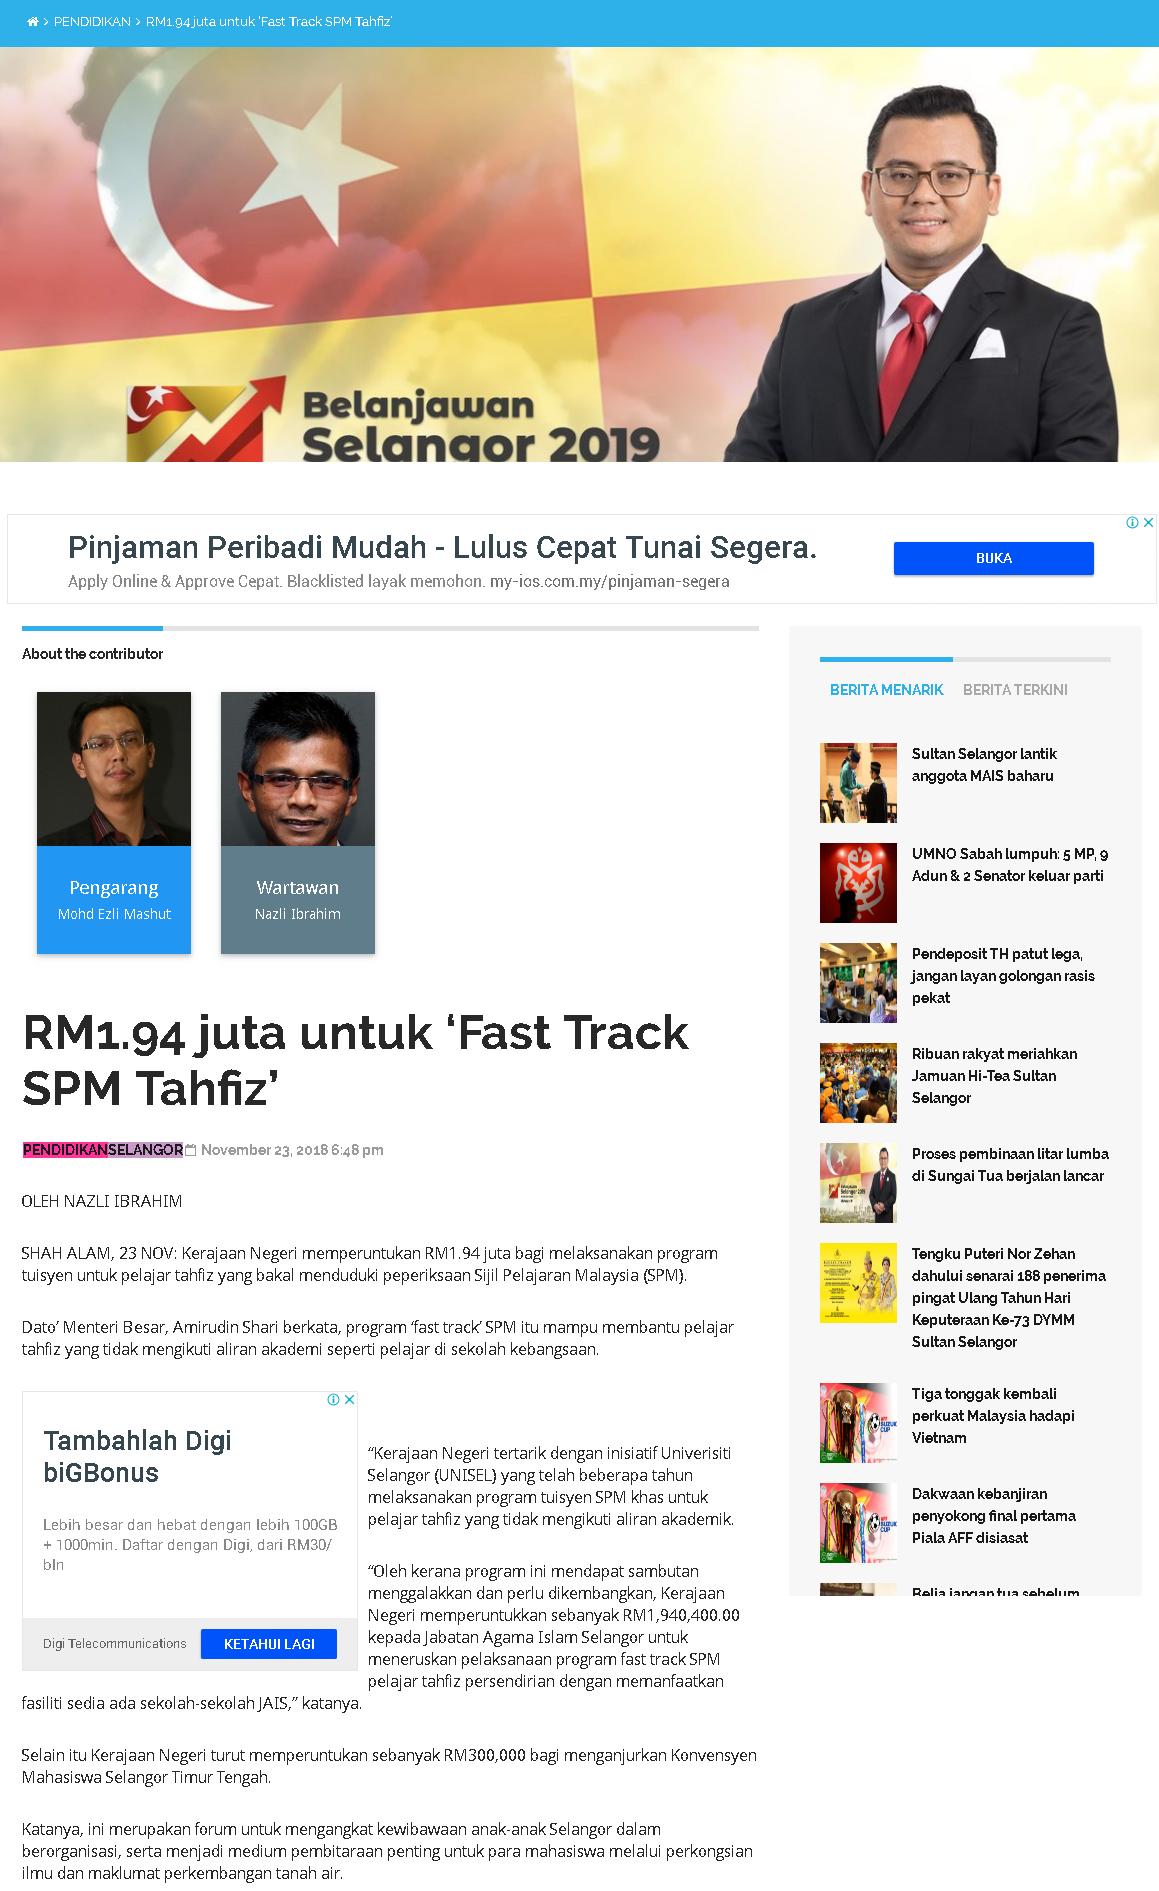 Selangorkini - 23 November 2018